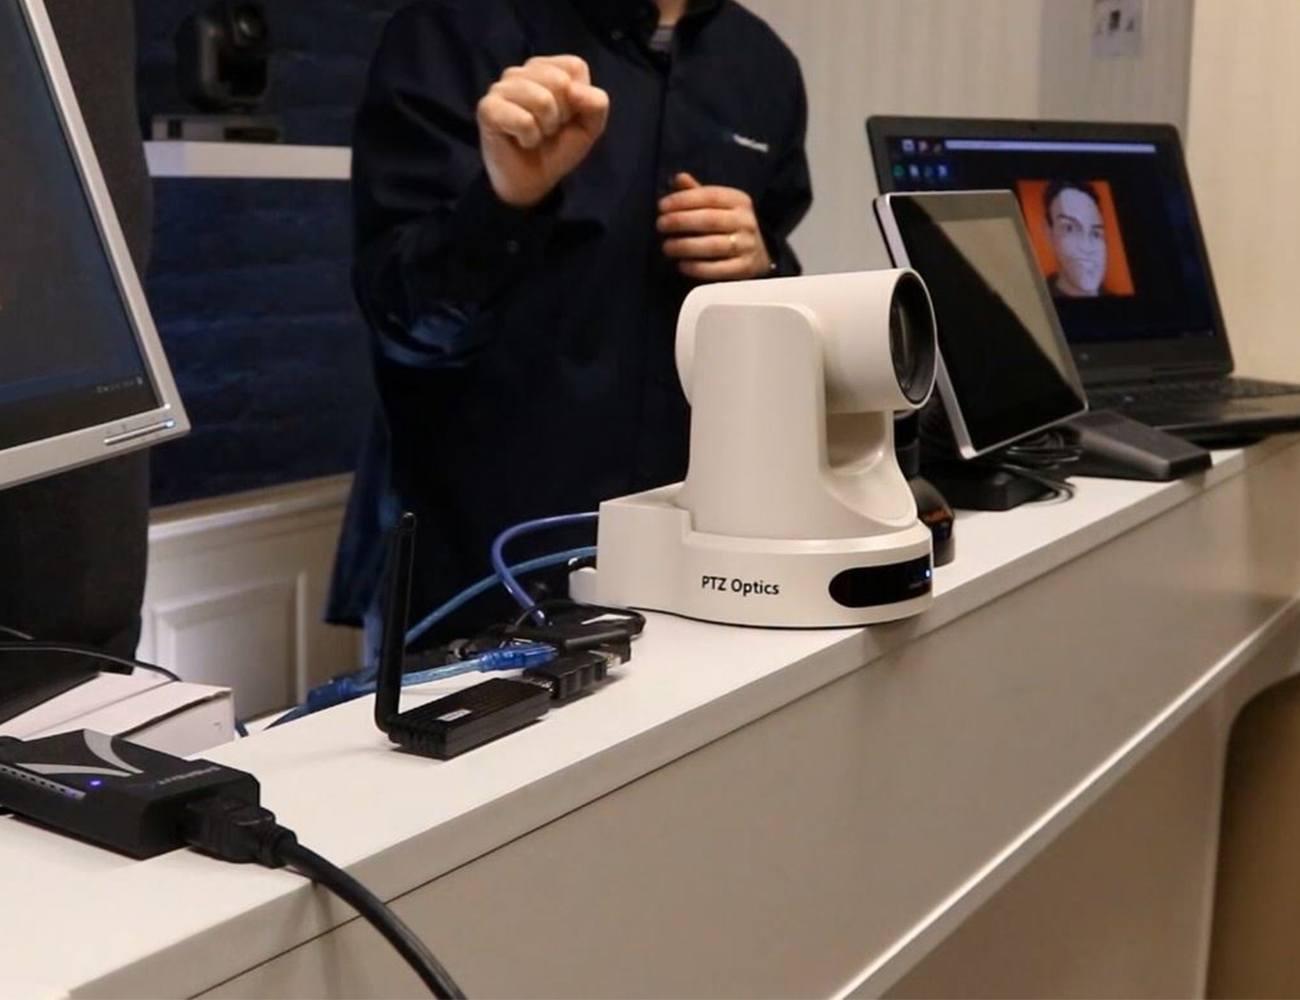 USB2Air Wireless USB Video Extension System